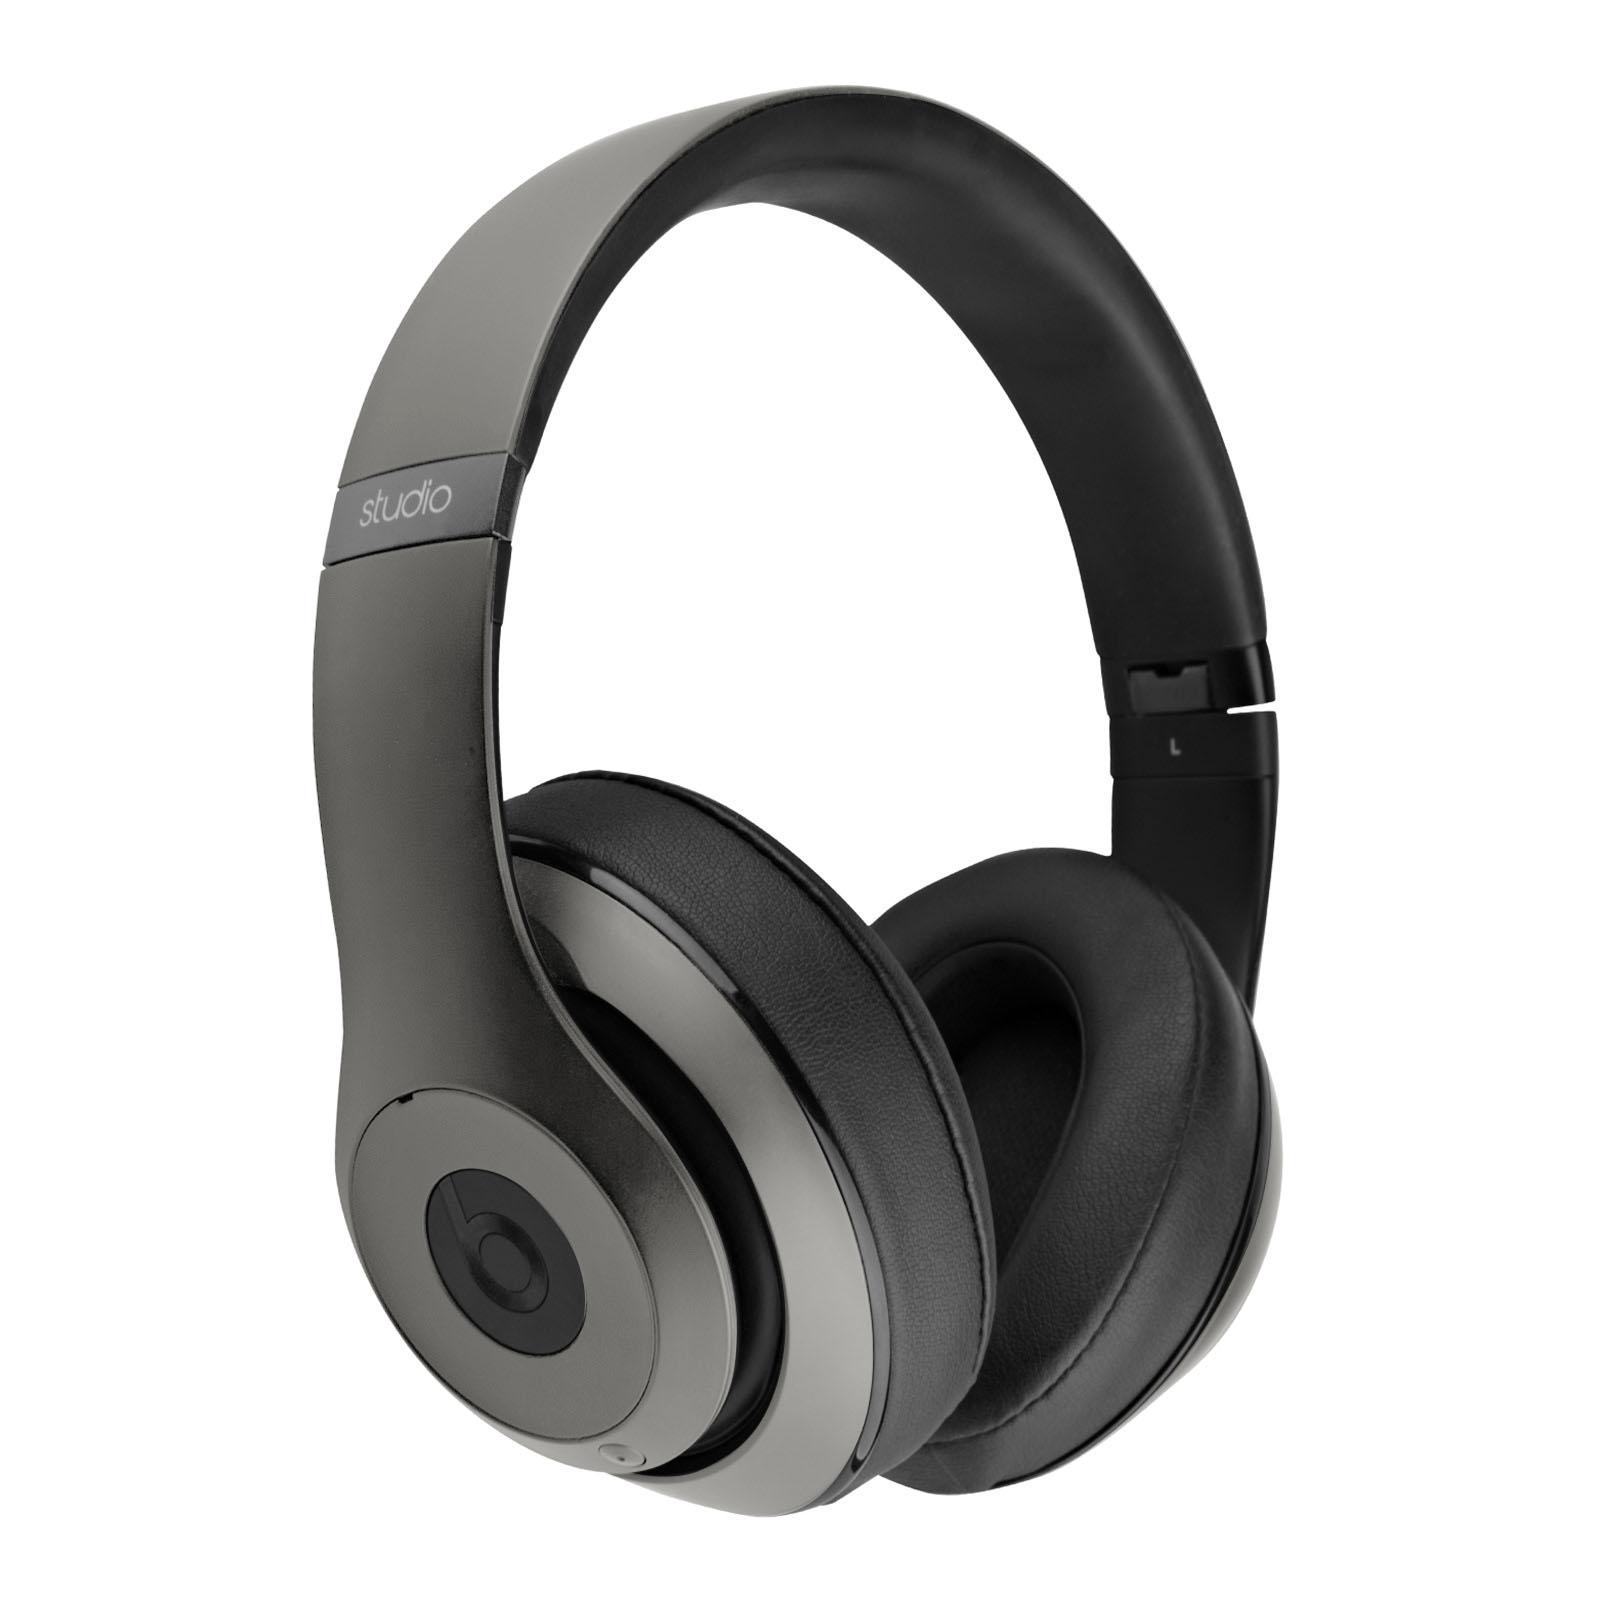 Beats wireless headphones headband - beats headphones wireless noise cancellation